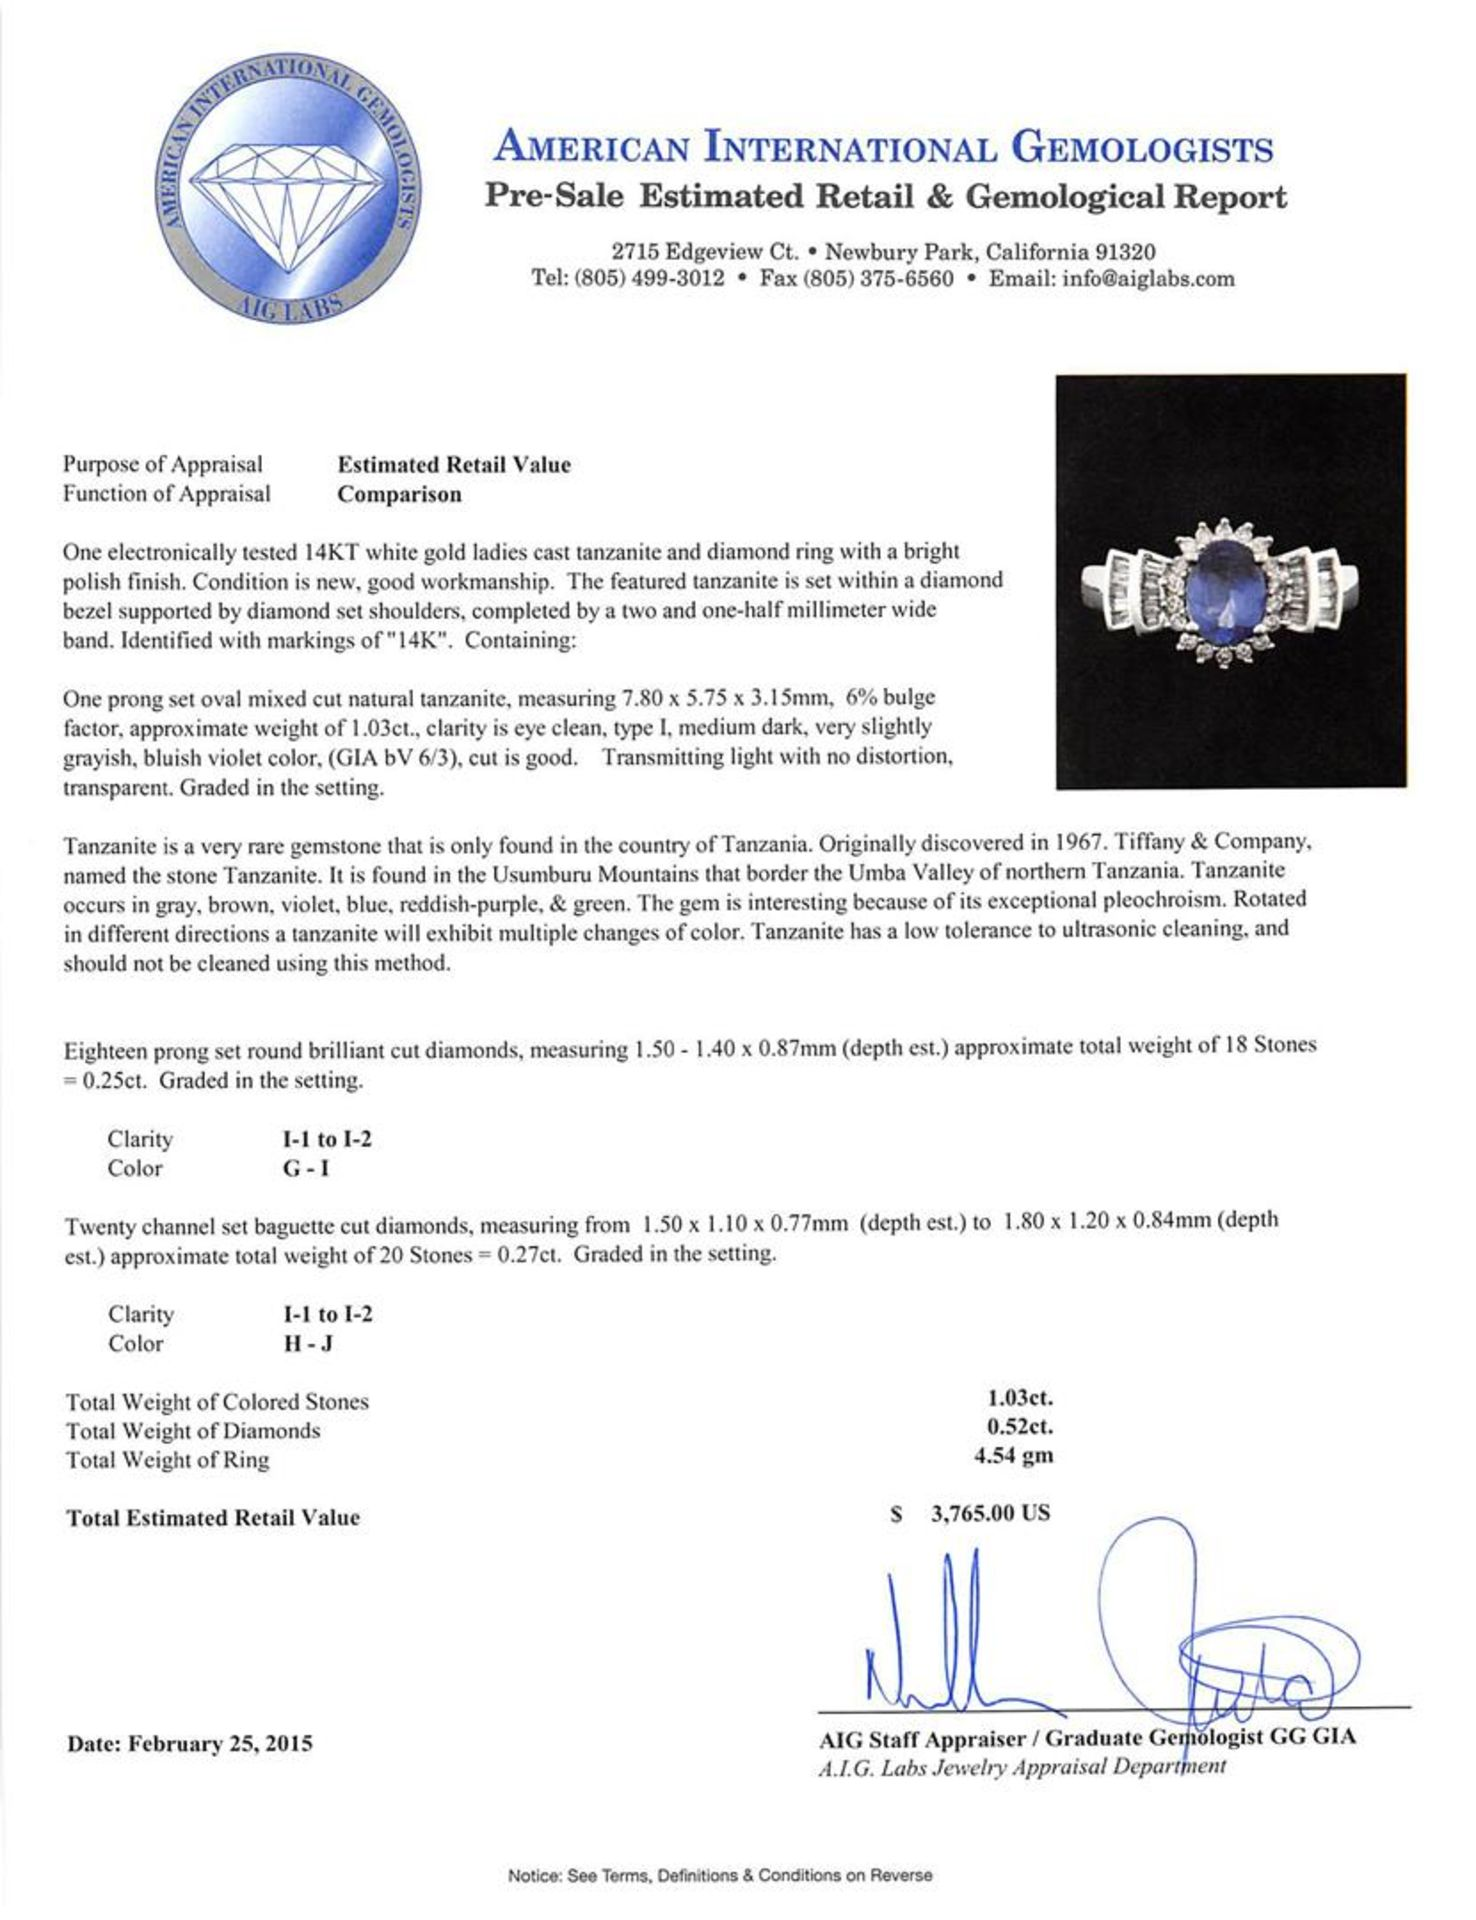 14KT White Gold 1.03ct Tanzanite and Diamond Ring - Image 3 of 3